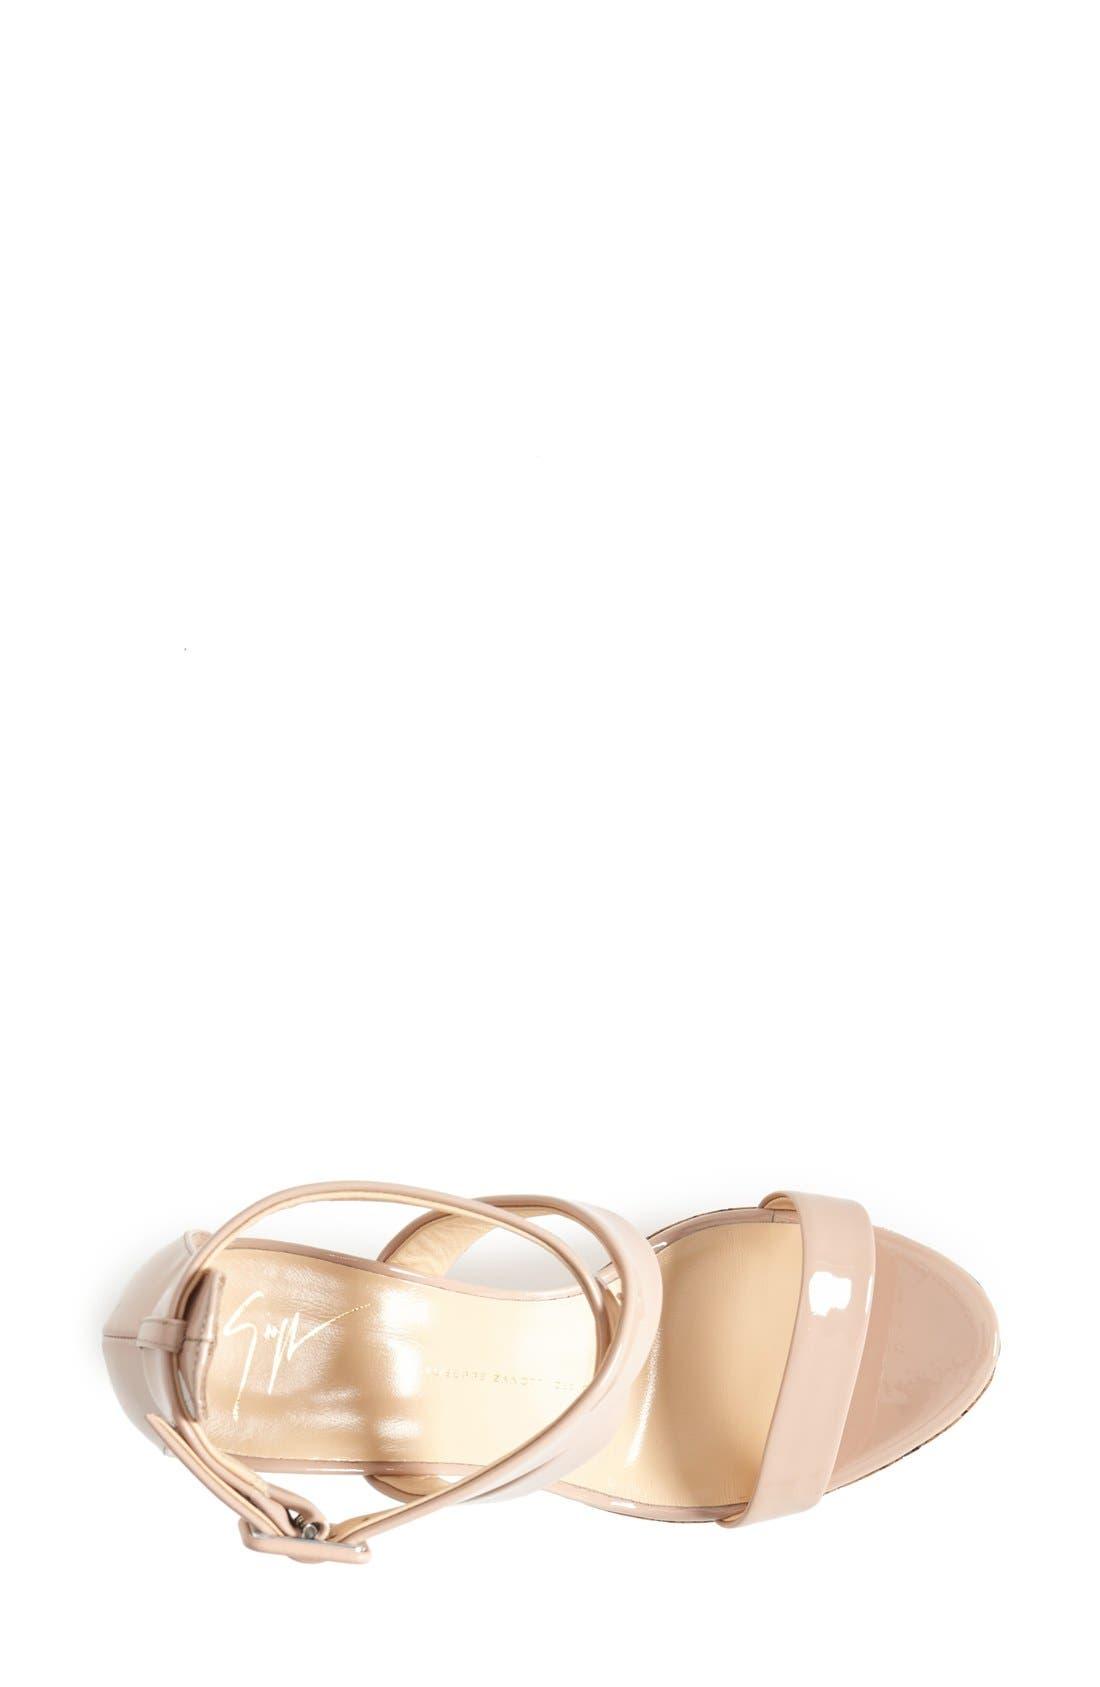 Alternate Image 3  - Giuseppe Zanotti 'Roz' Platform Wedge Sandal (Women)